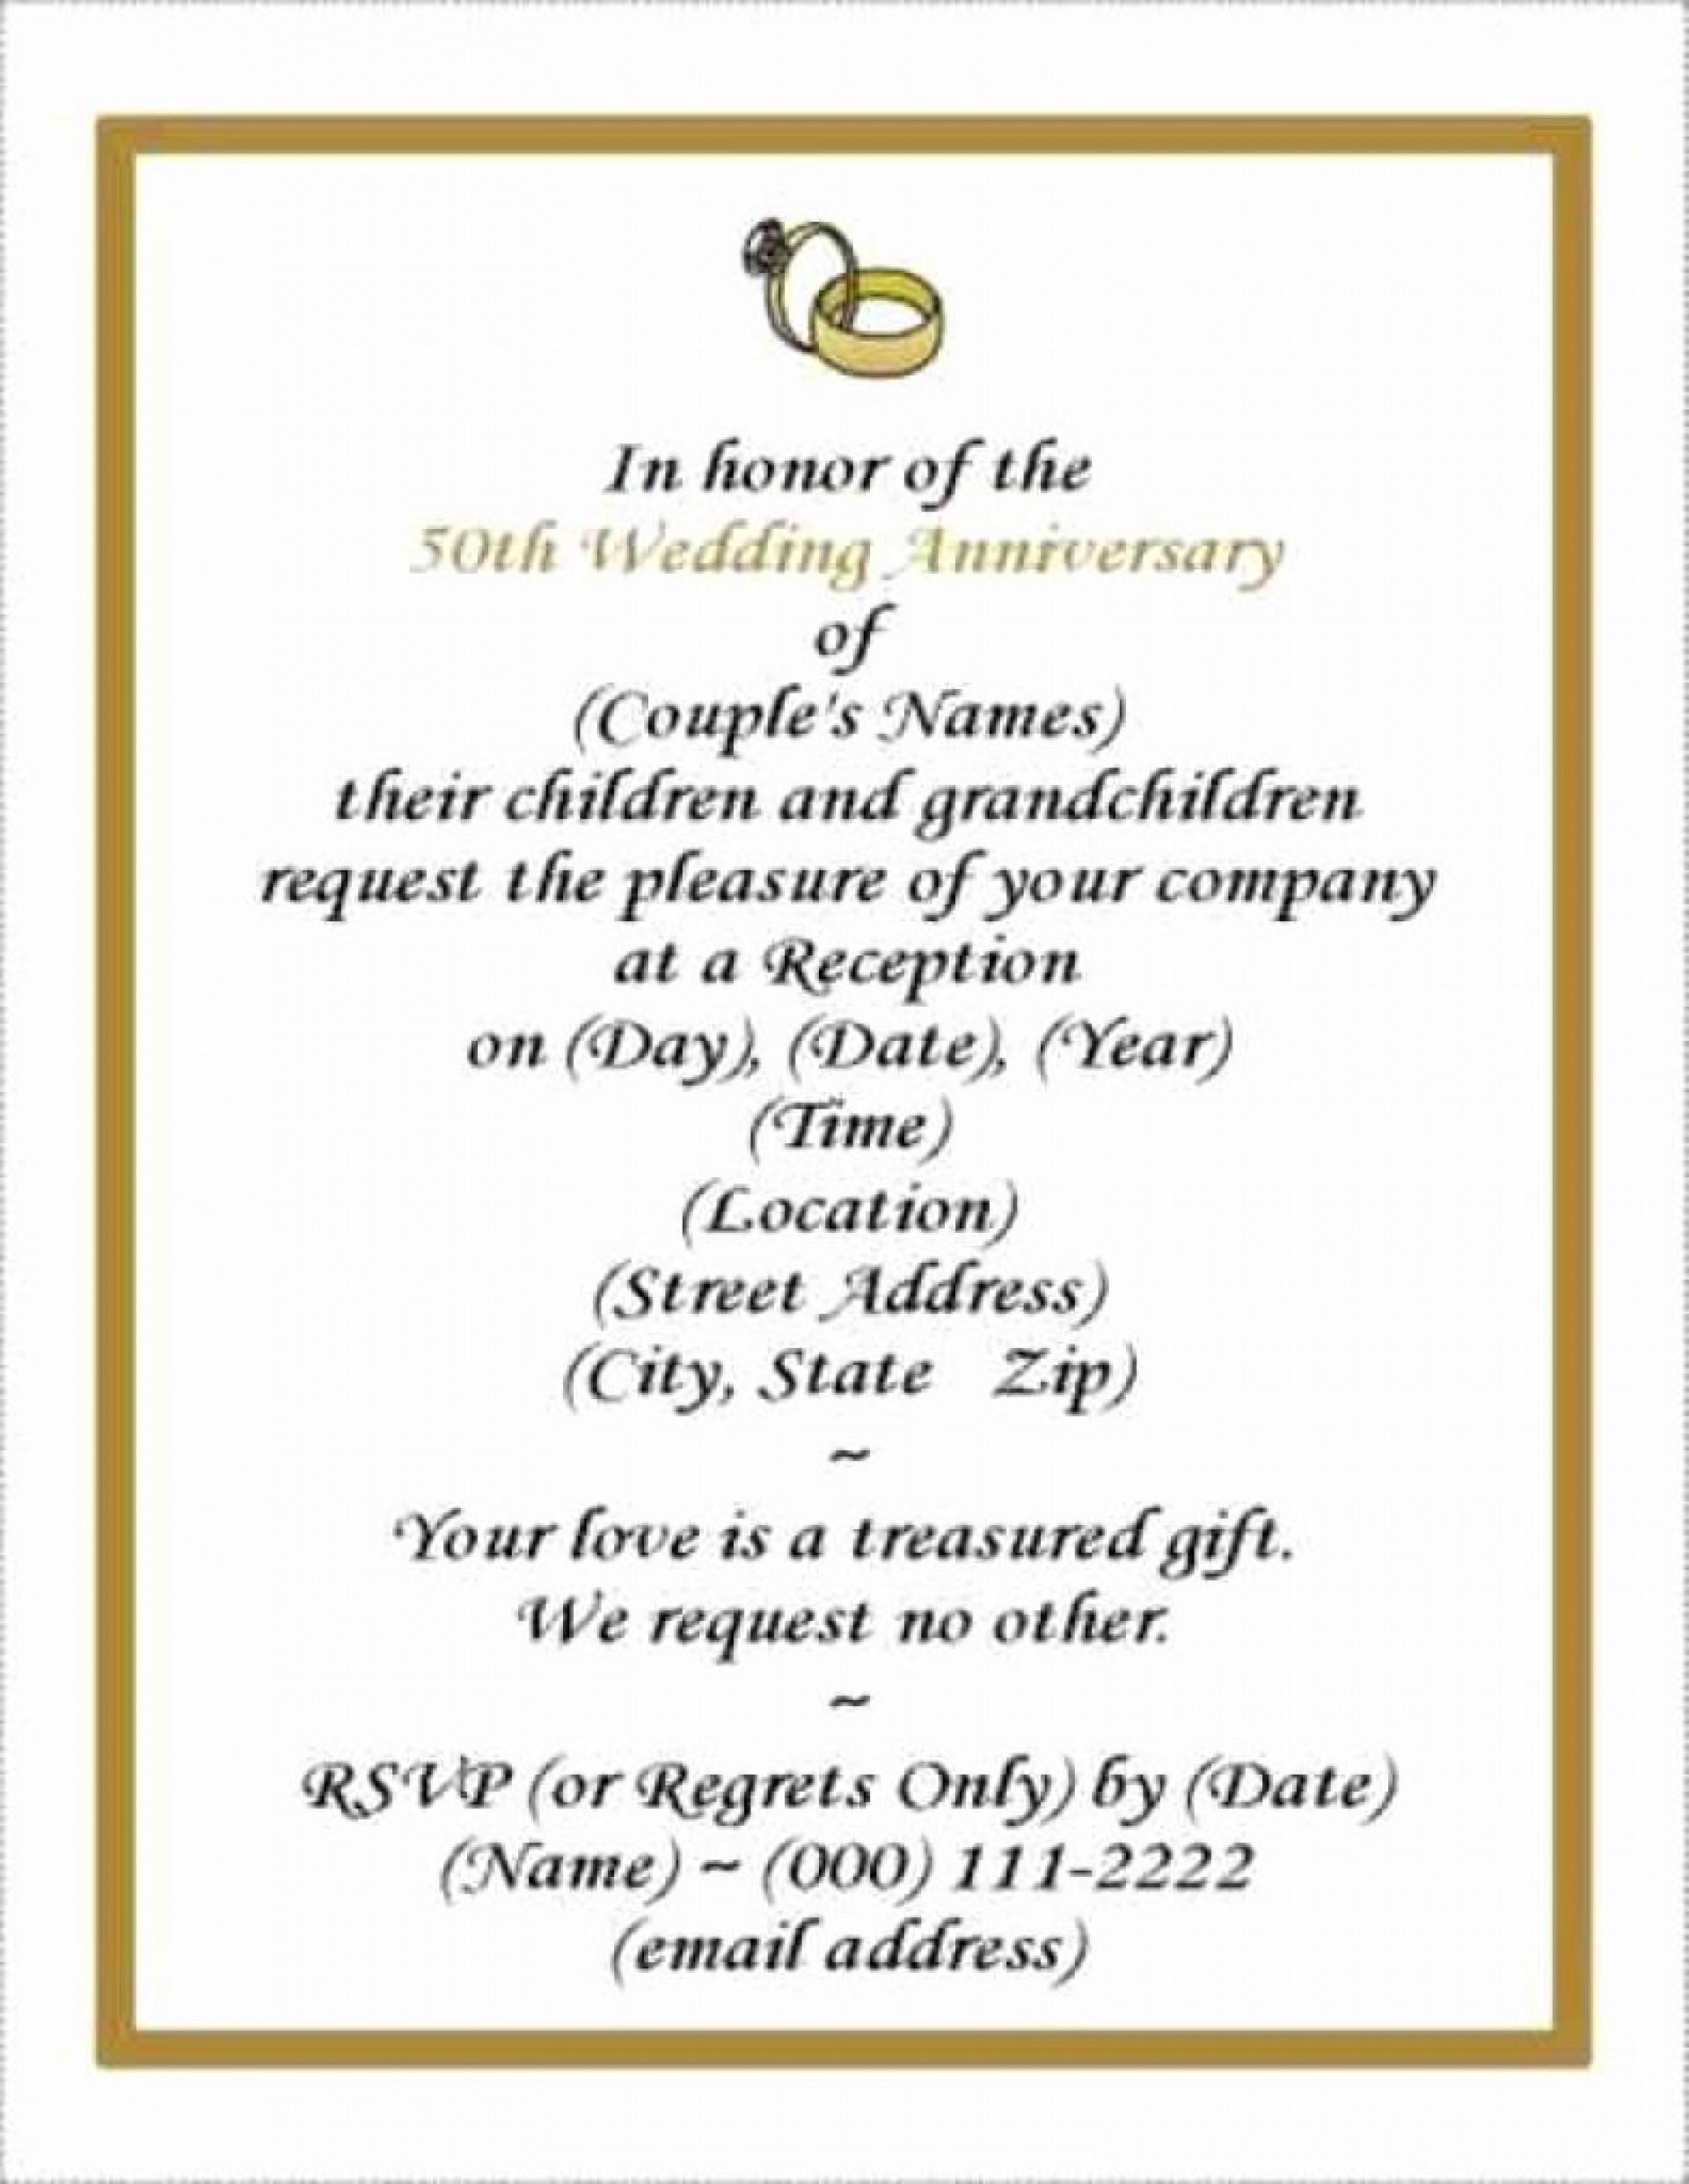 001 Rare Free Printable 50th Wedding Anniversary Invitation Template Design 1920